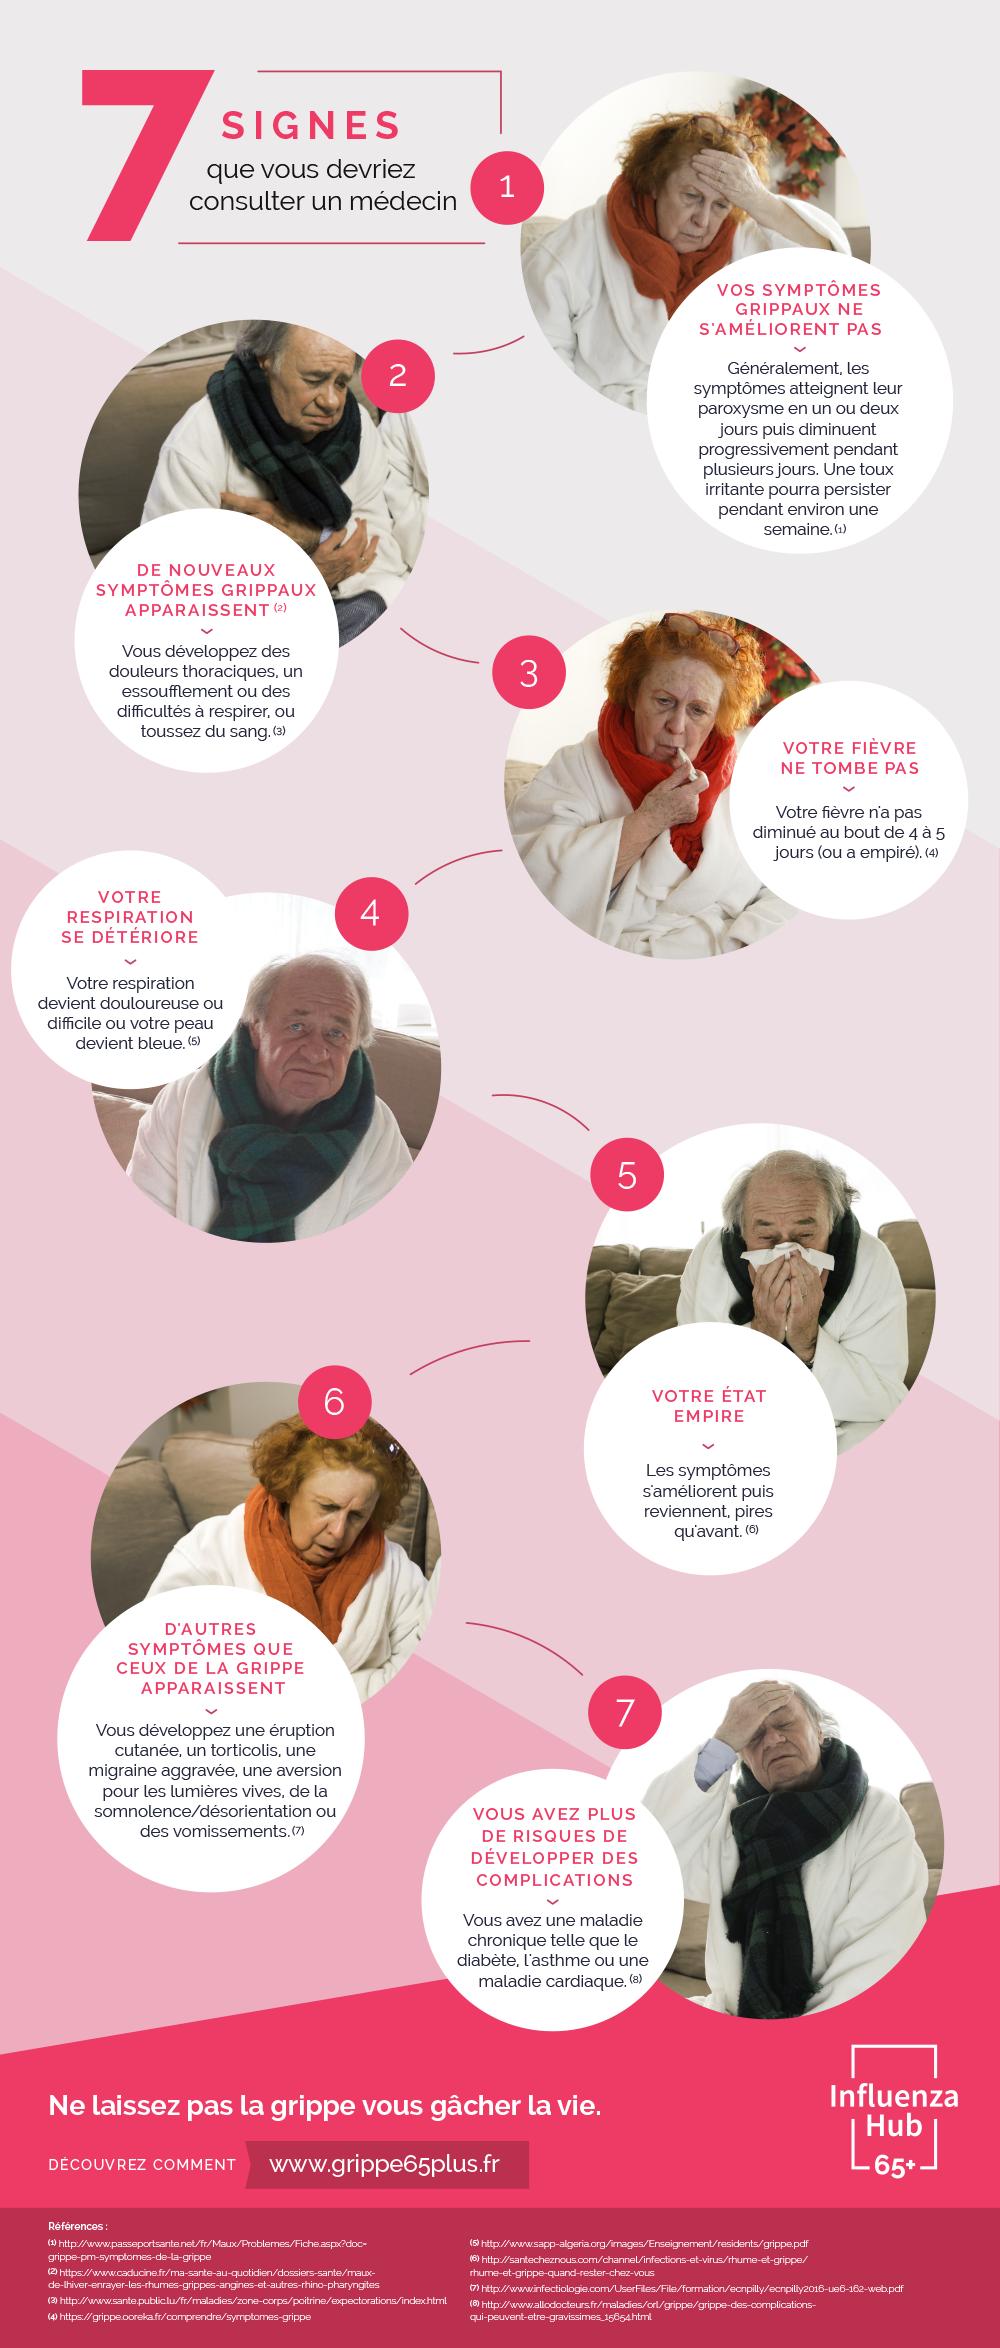 7 signes qu'il faut consulter son médecin